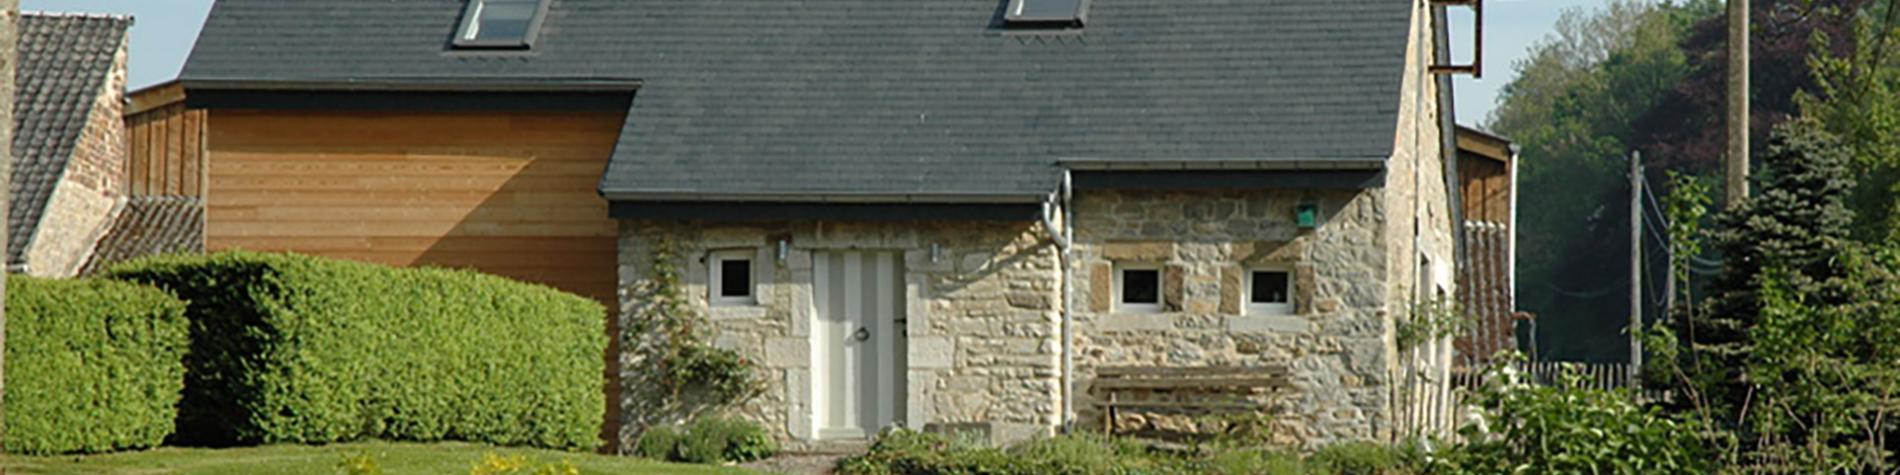 Gîte Rural - Forge - Englebermont - Neupré